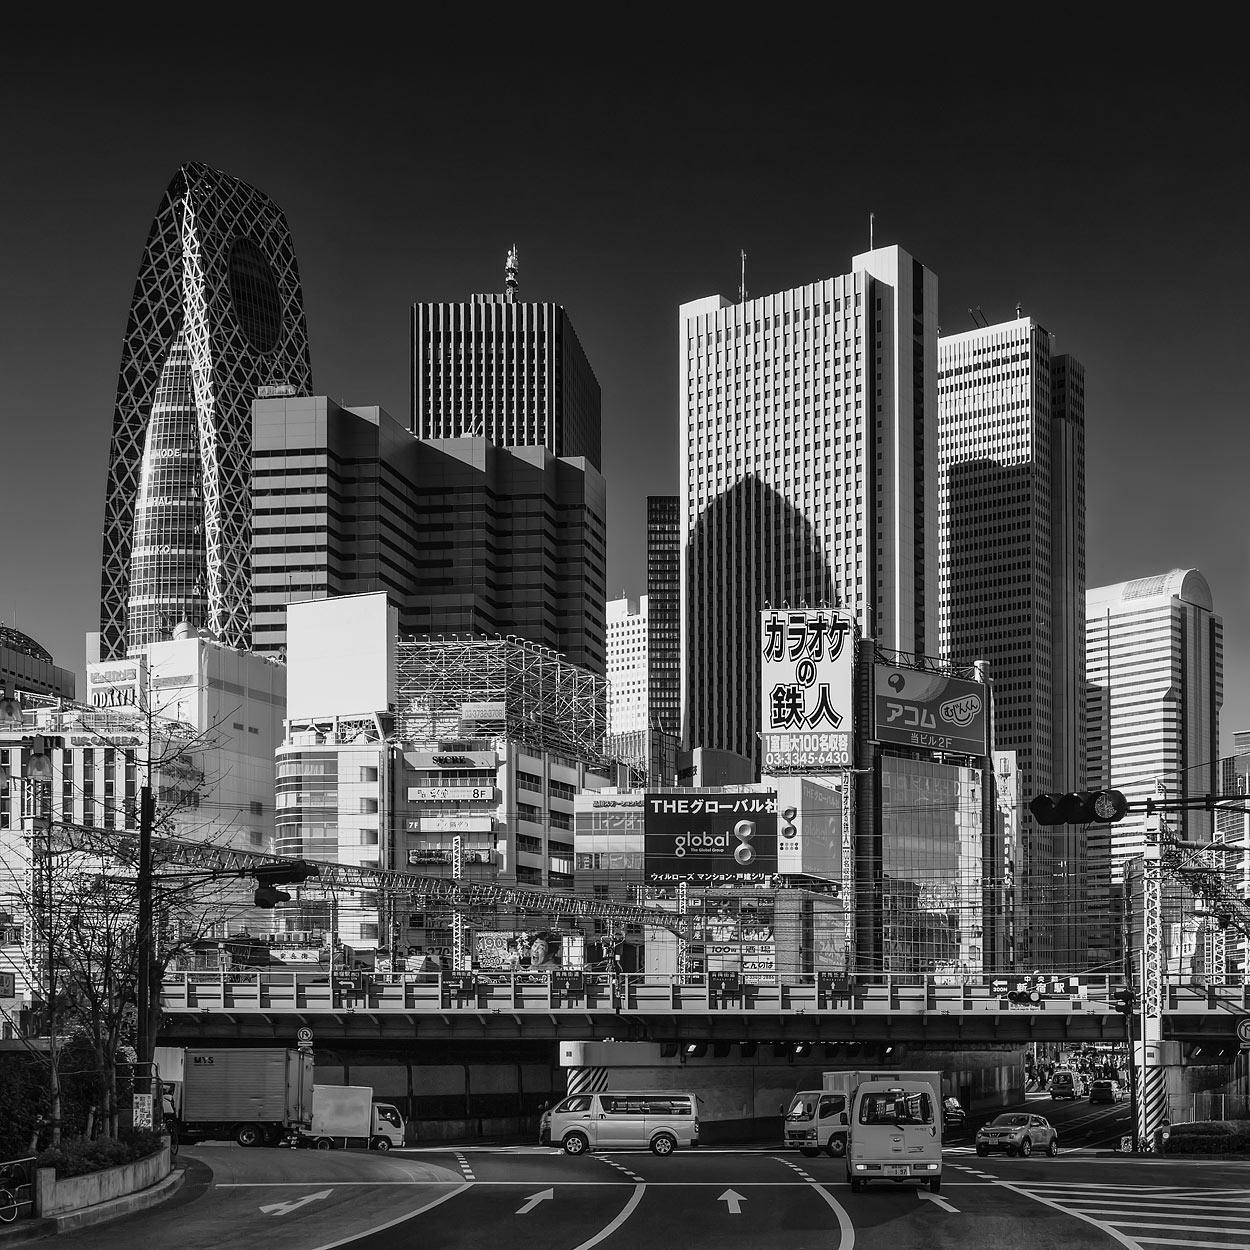 Tokyo, Japan - Shinjuku Skyline as Seen from Kabukichō